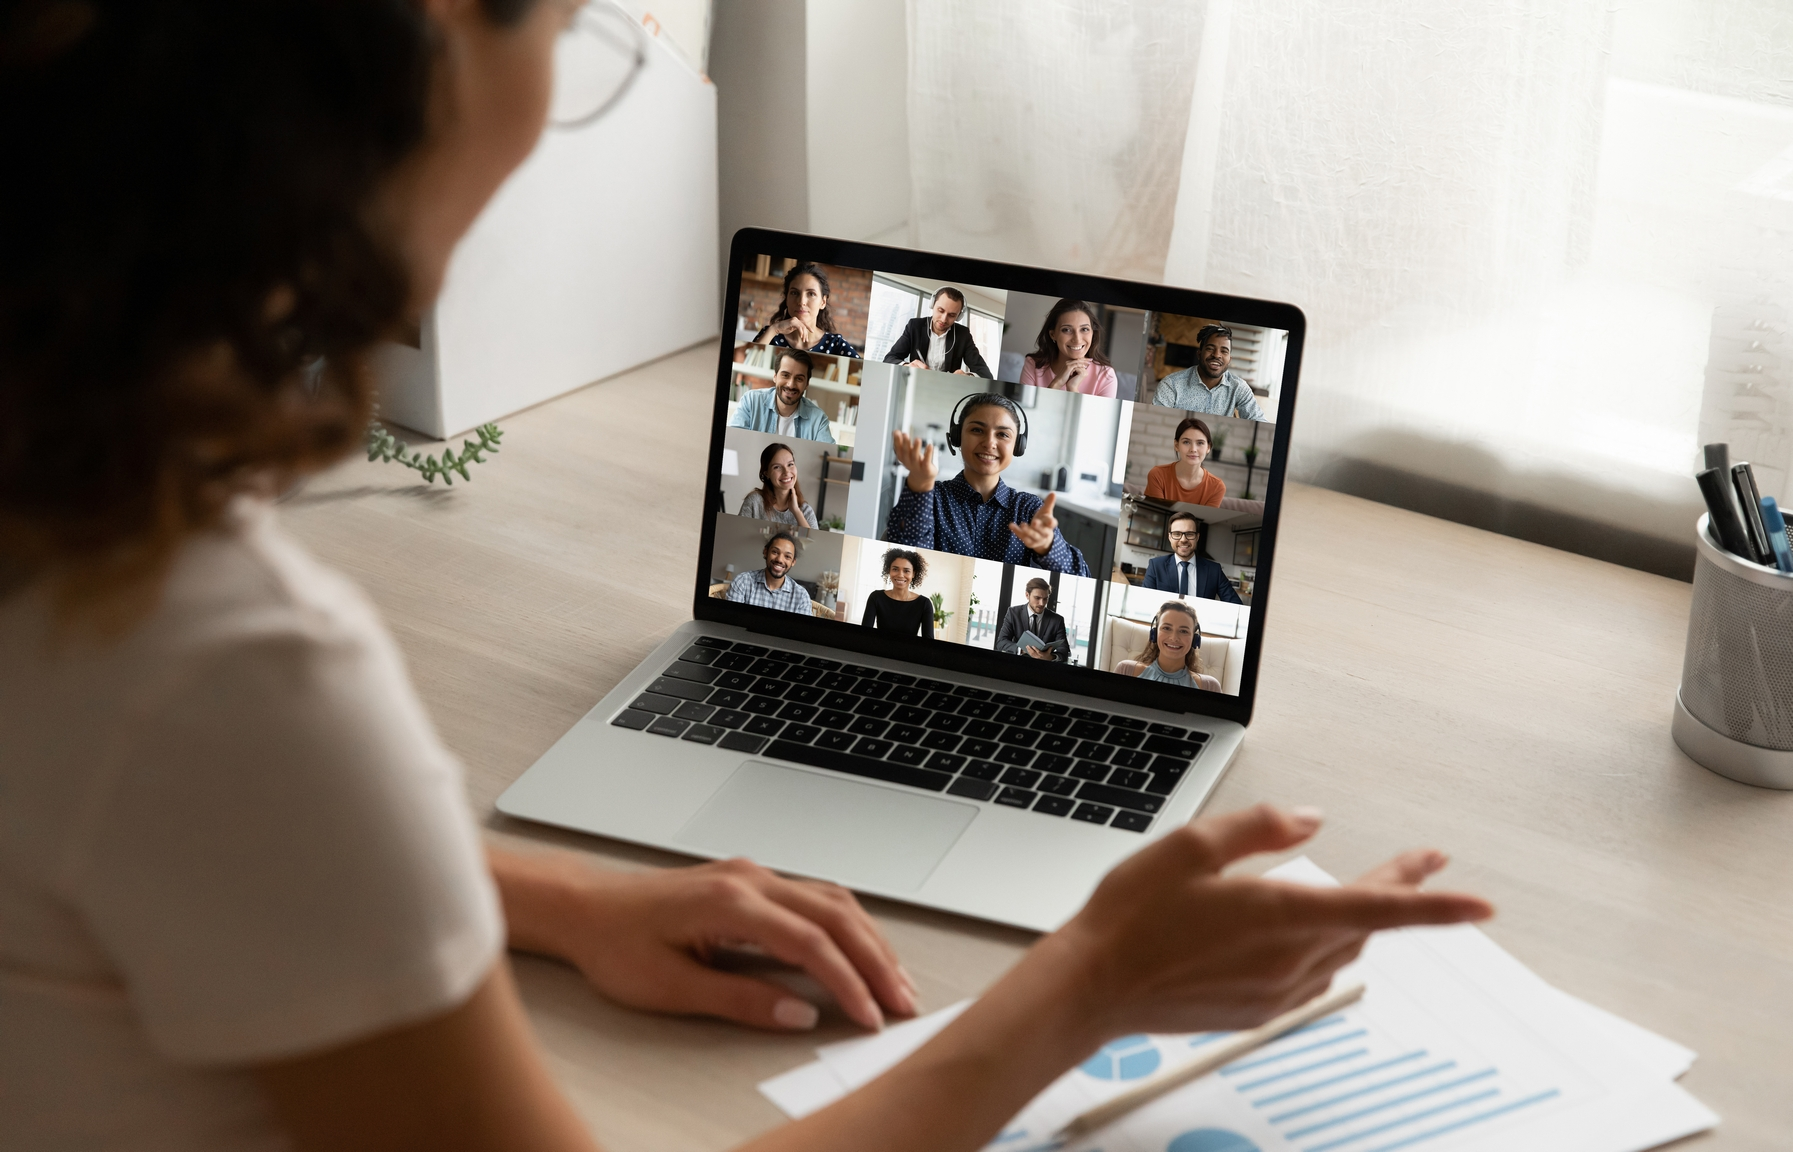 Virtuelles Kick-Off Meeting Präsetation